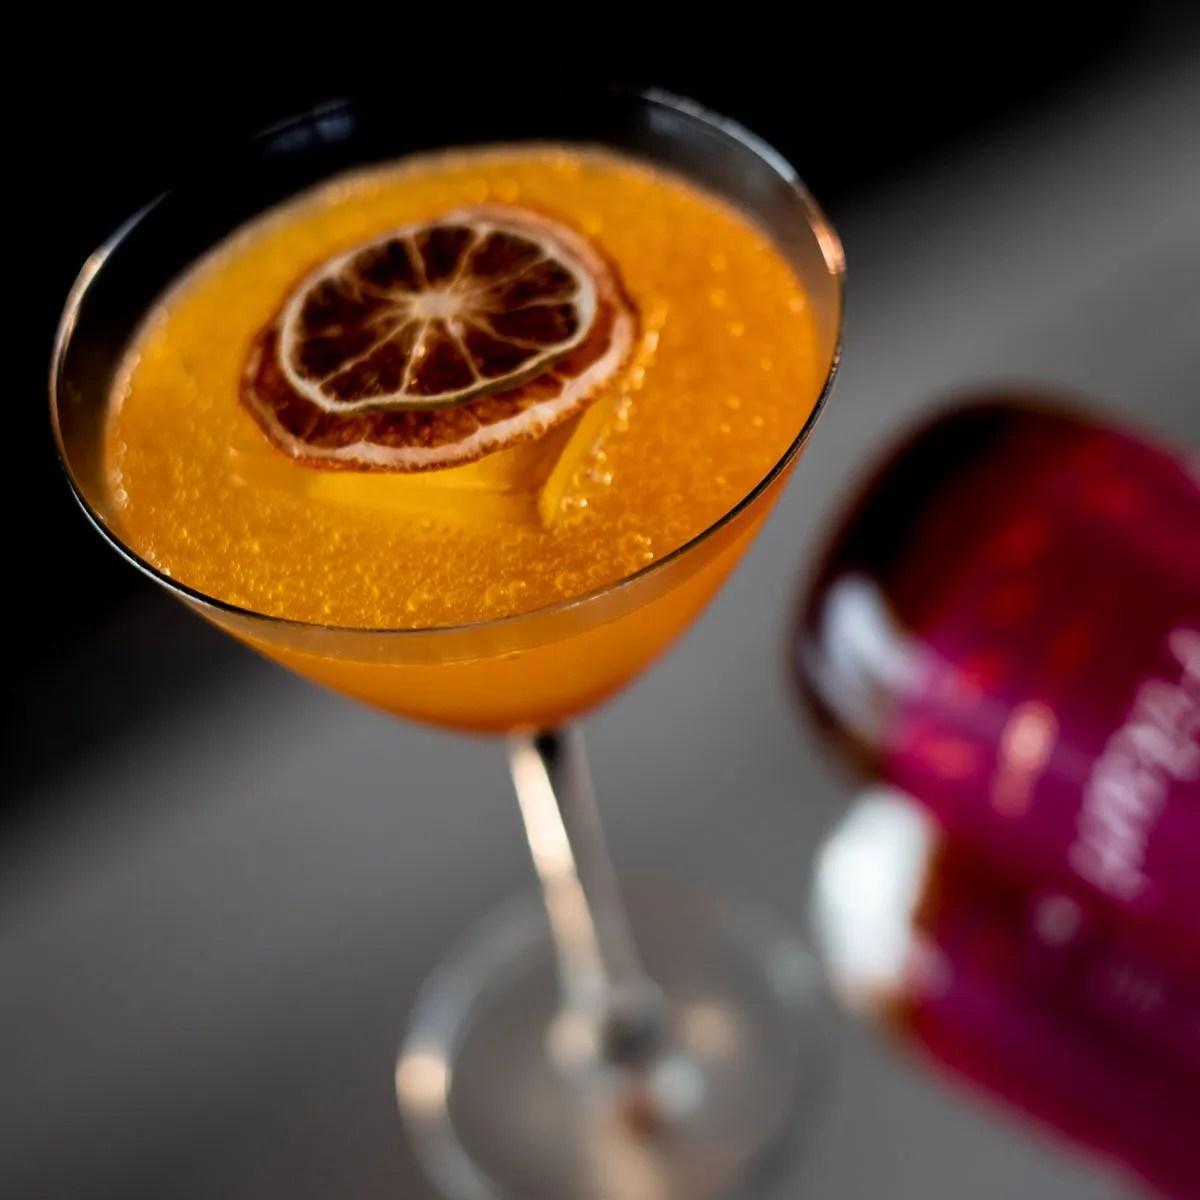 Fikurì Cocktail - Tenuta del Duca